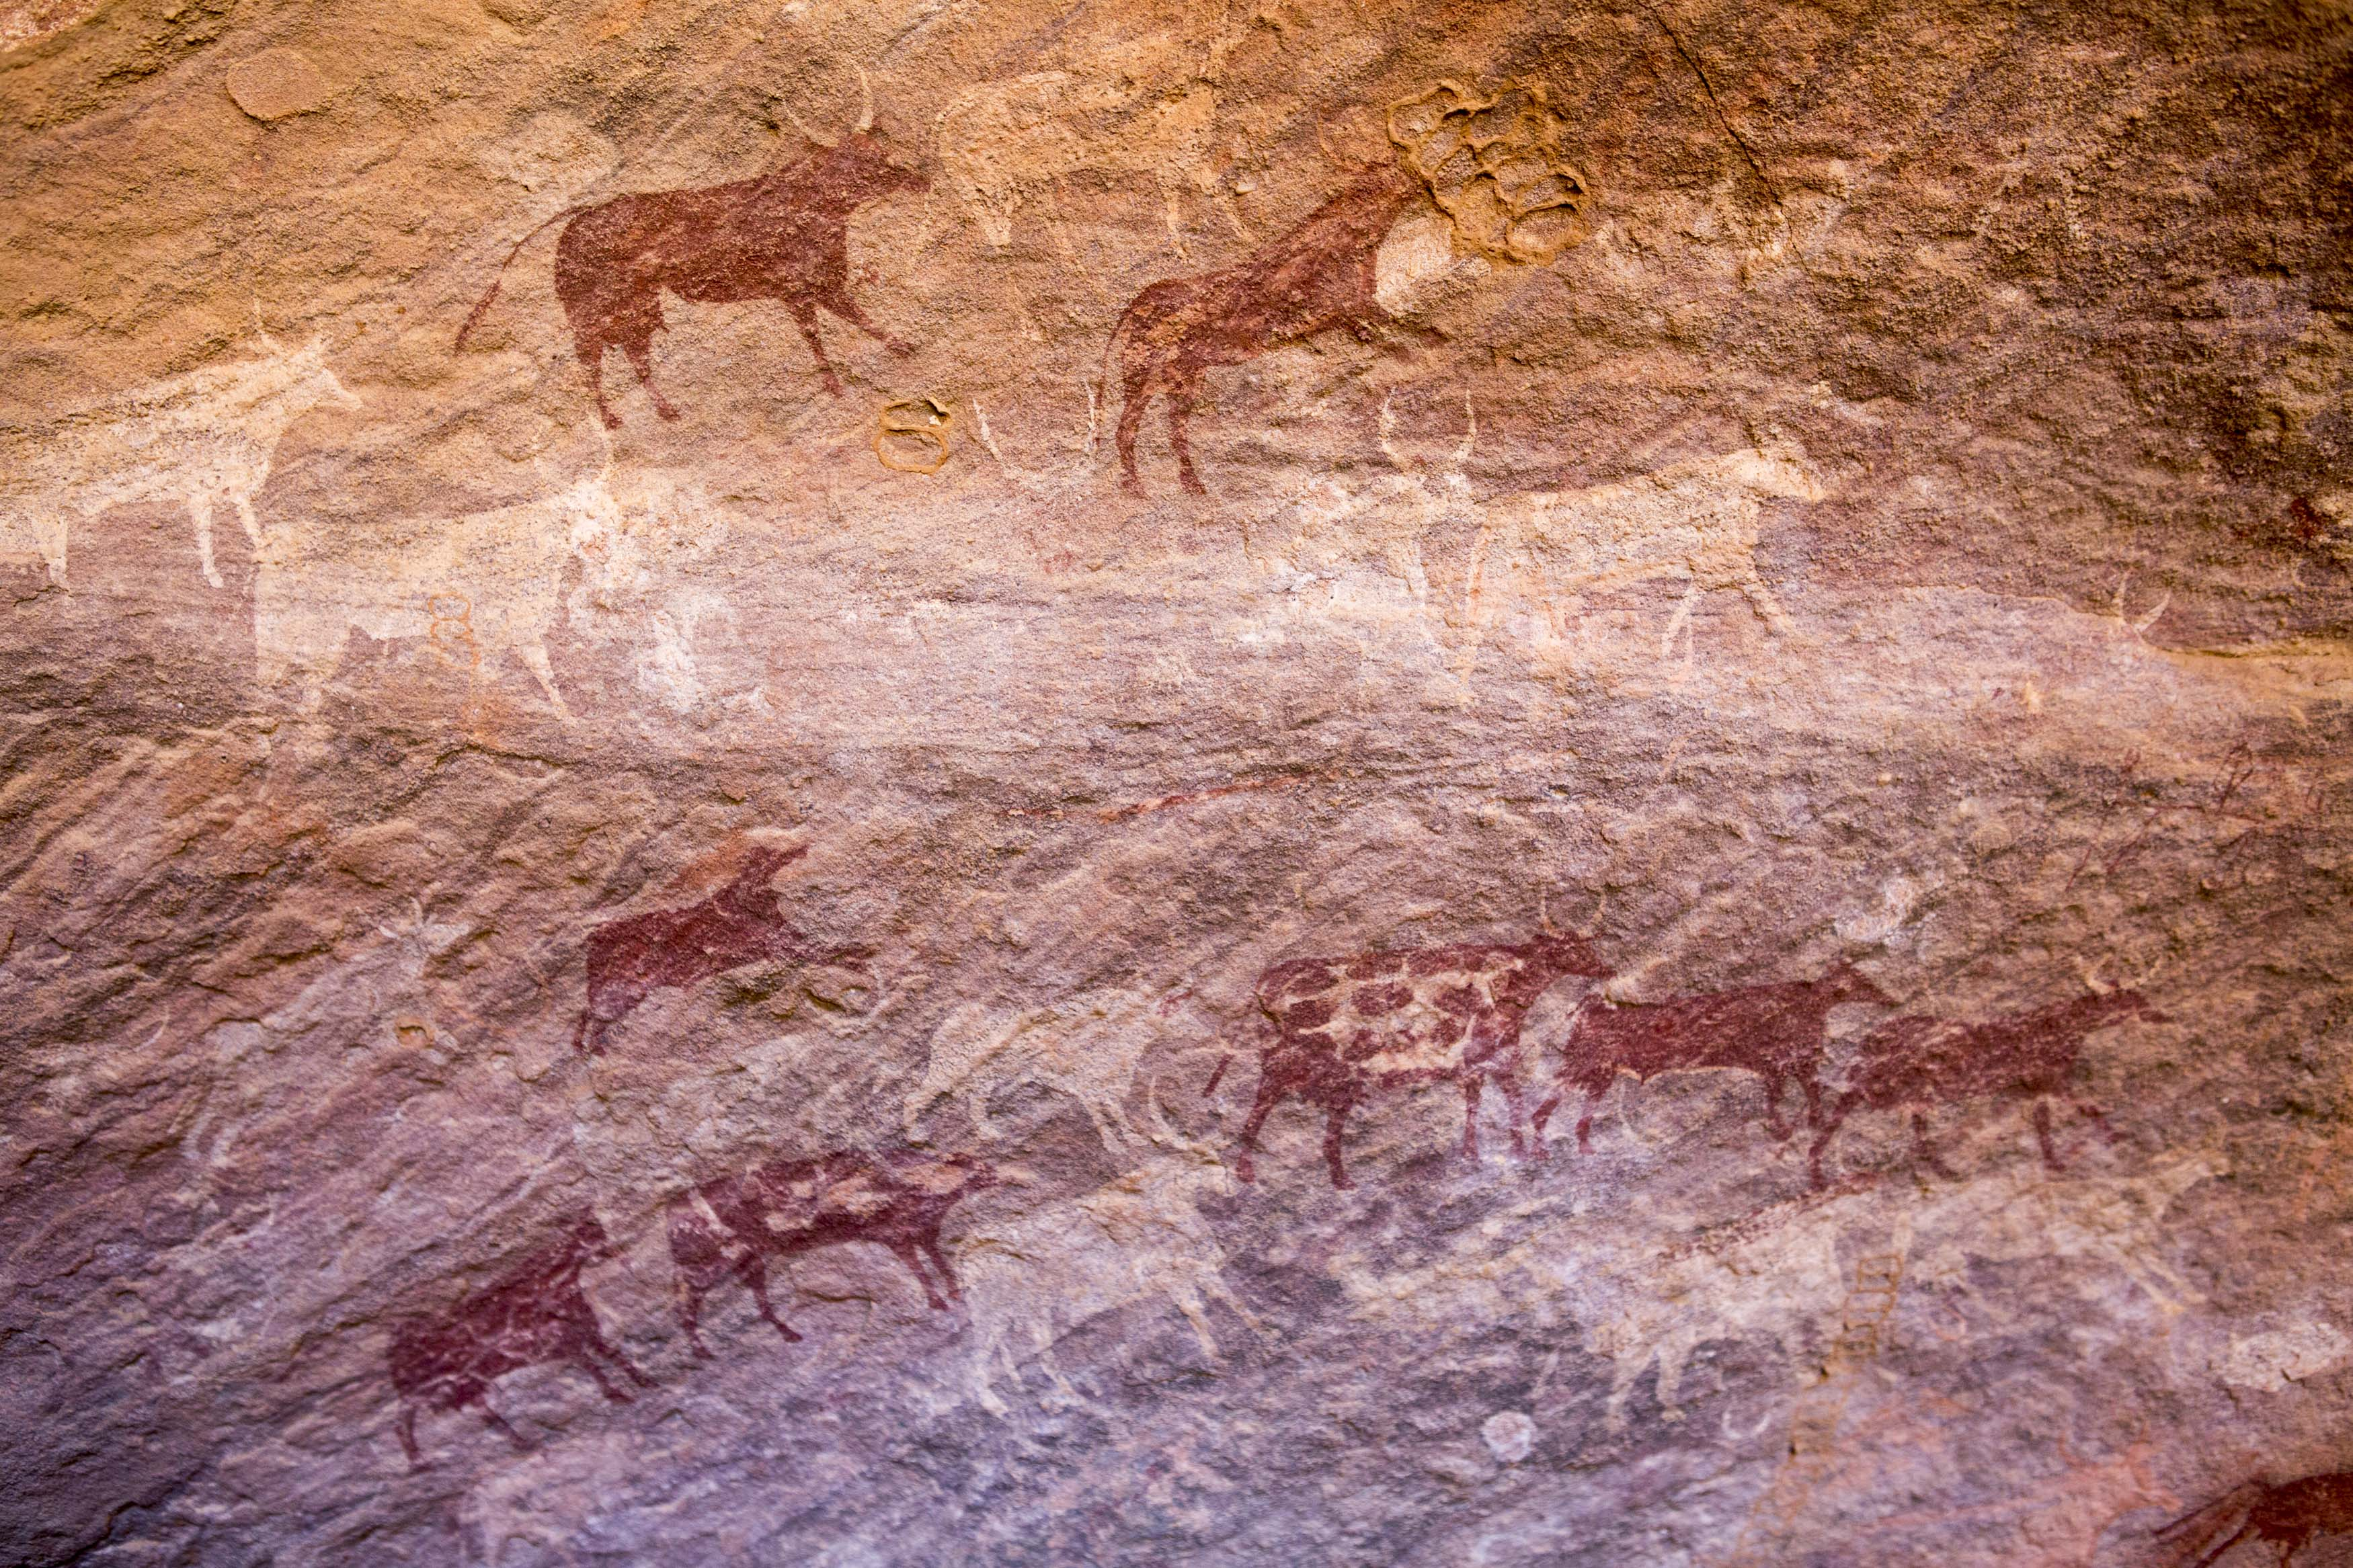 Cave painting depicting cows on a wall in the Tadrart.The Tadrart (200 km southeast of Djanet) is located in the south of the Tassili N'Ajjer National Park and is part of one of the most beautiful desert in the world but above all the central Sahara.From huge canyons to cliffs carved with rocky peaks of various shapes mix with dunes of colored sand with yellow and red reflections. The Tadrart, Algeria-February 6, 2017.Peinture rupestre représentant des vaches sur une paroi dans la Tadrart. La Tadrart (200 km au sud-est de Djanet) se situe dans le sud du Parc National du Tassili N'Ajjer et il fait partie d'un des plus beau désert au monde mais avant tout du Sahara central. D'immenses canyons aux falaises sculptées avec de pitons rocheux aux formes les plus diverses  se mélangent avec des dunes de sable coloré aux reflets jaune et rouge. La Tadrart,, Algérie-6 février 2017.